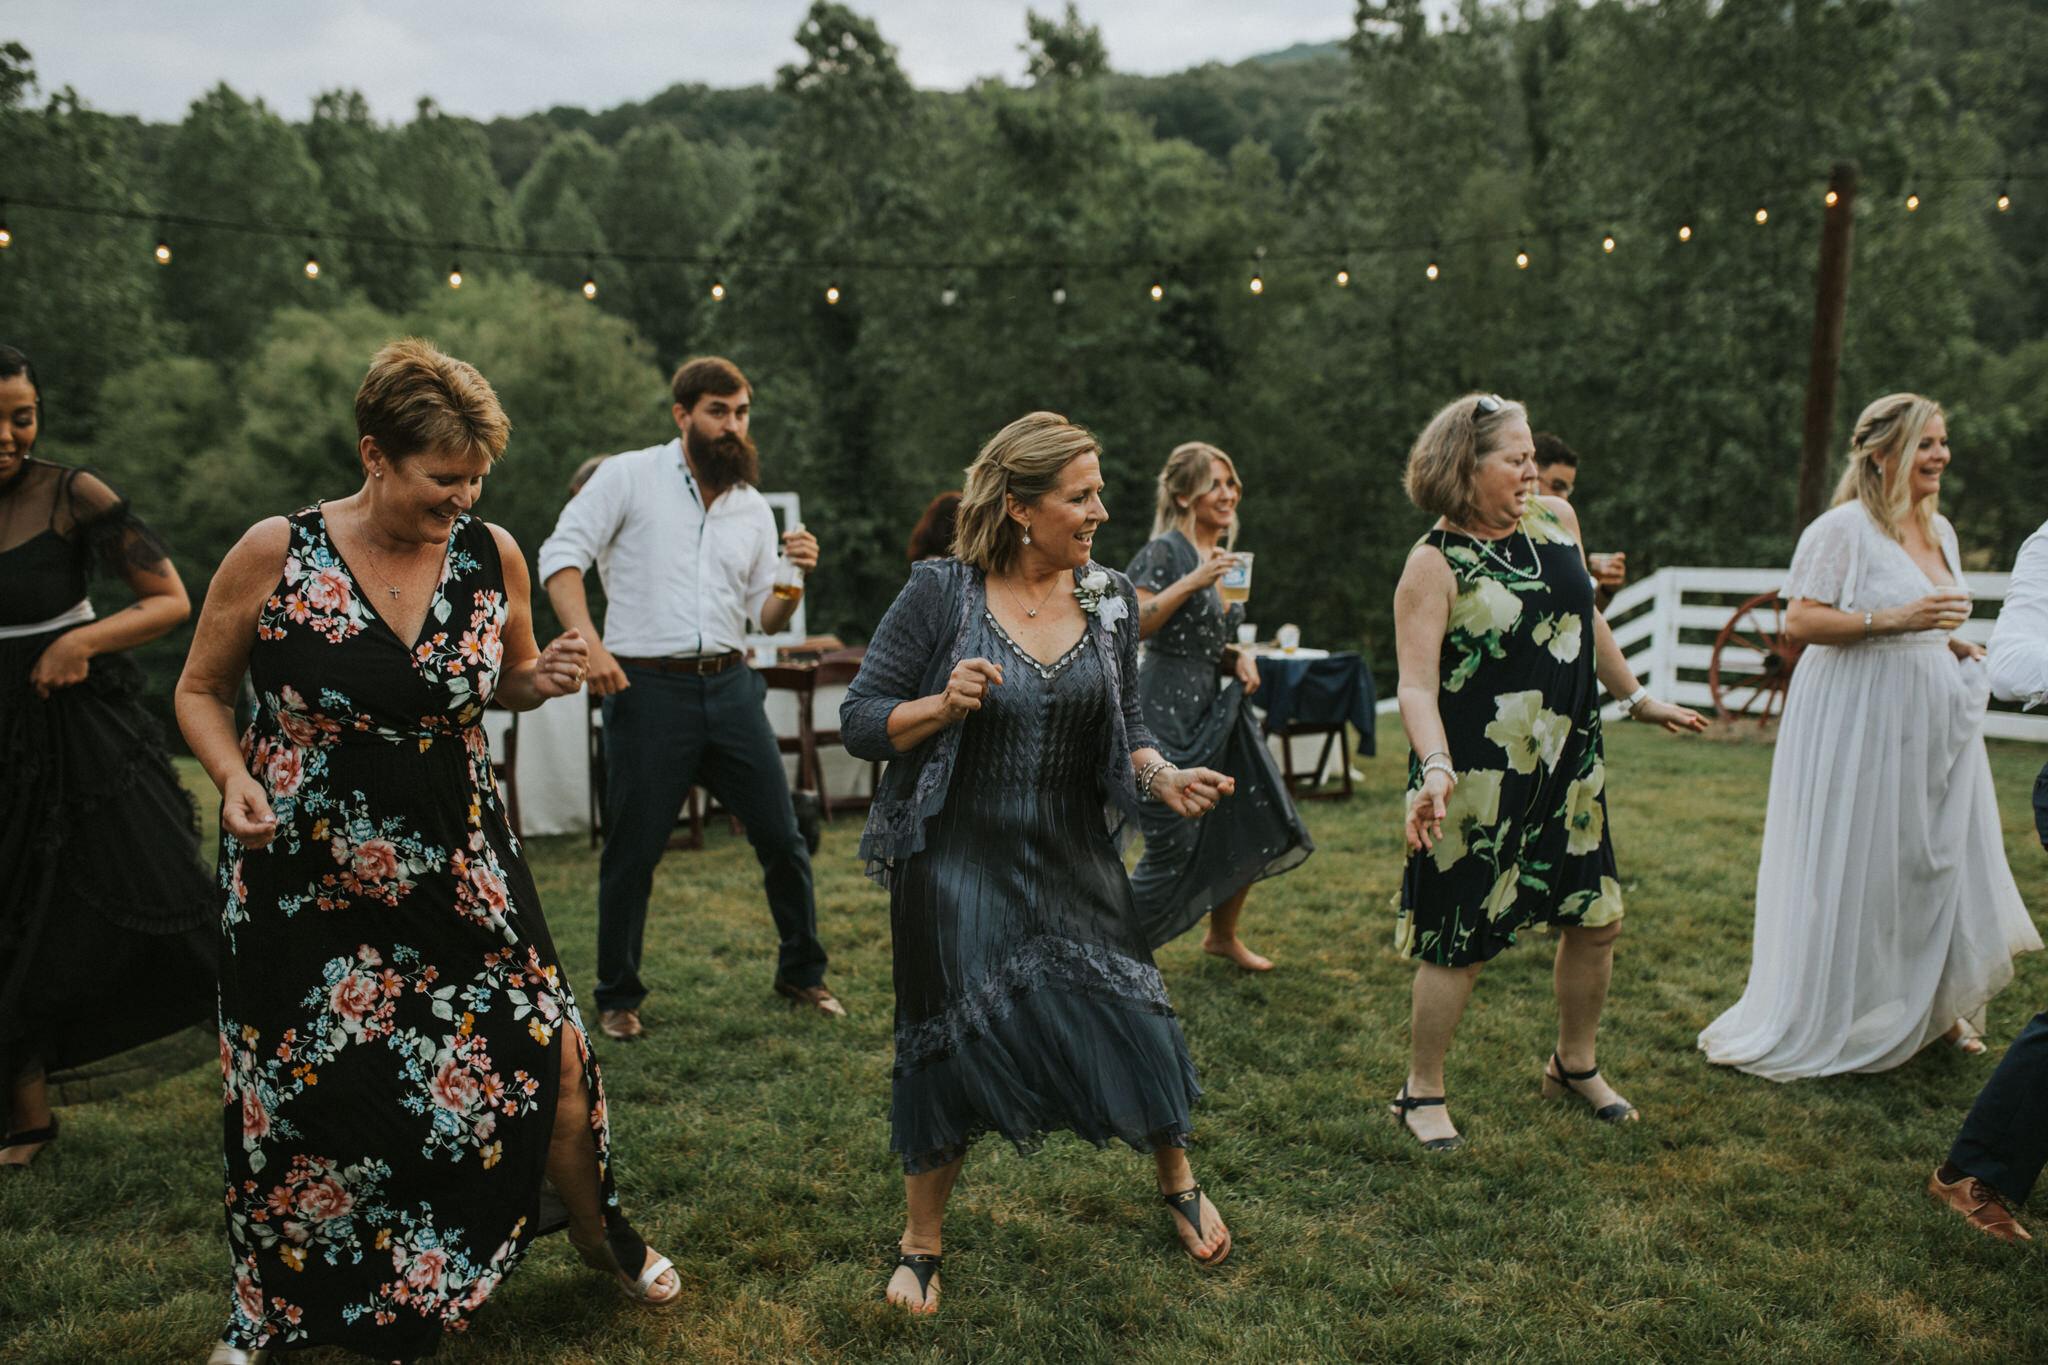 KateMatt-North-Georgia-Wedding-Photographer-Mountain-Laurel-Farm-150.jpg